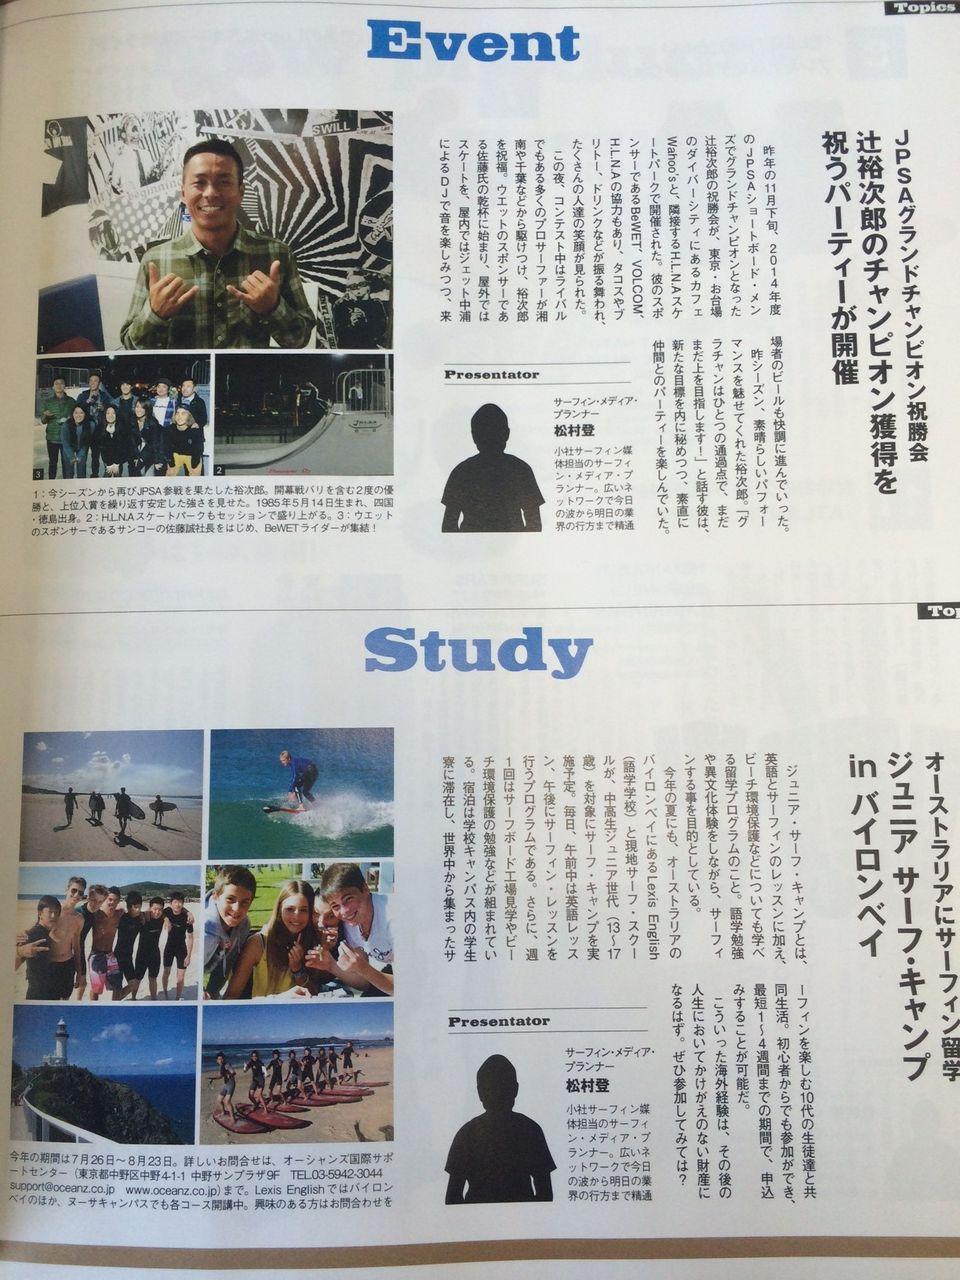 STJ ページ写真� 201501